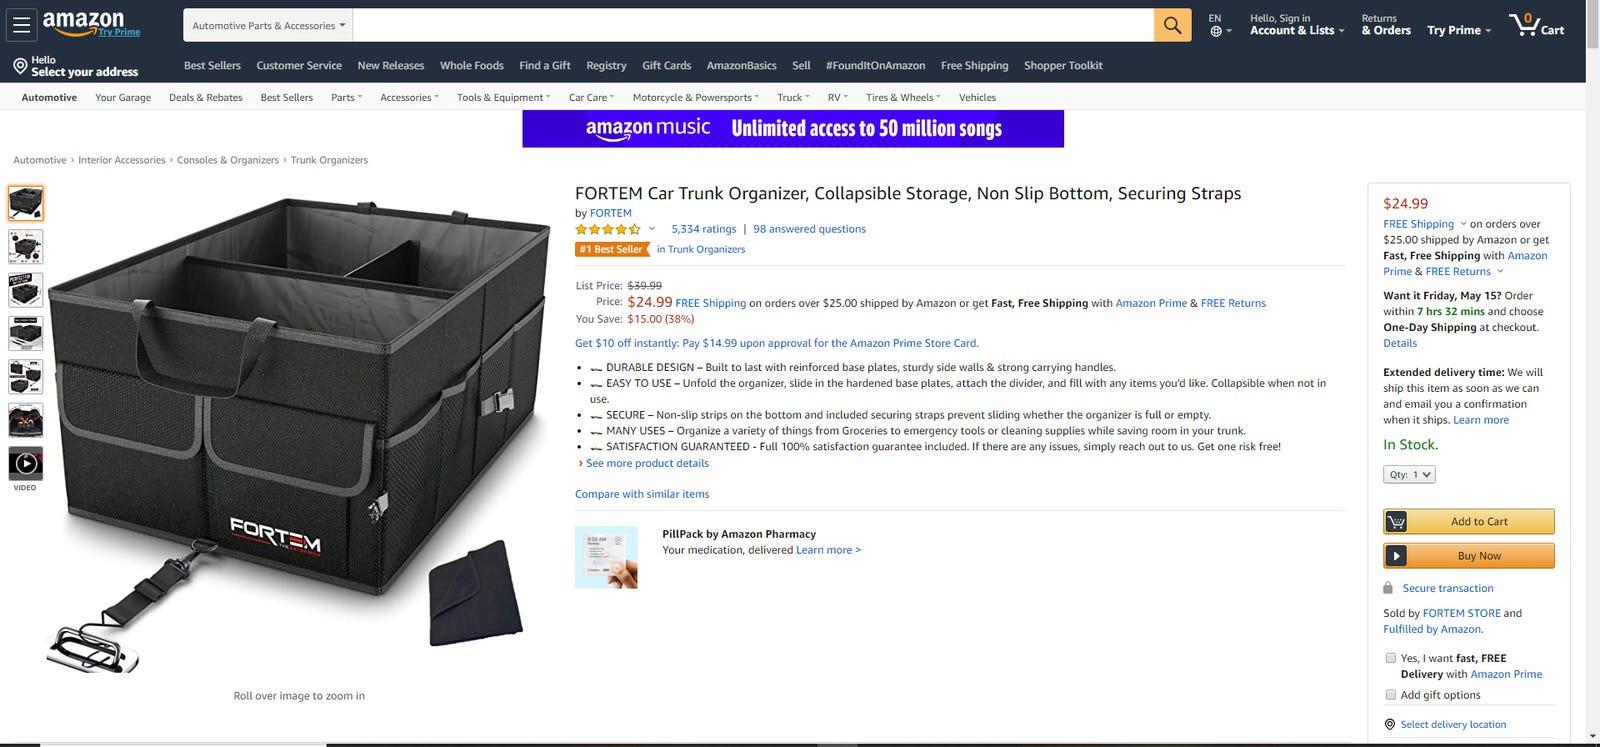 Fortem's car trunk organizer on Amazon